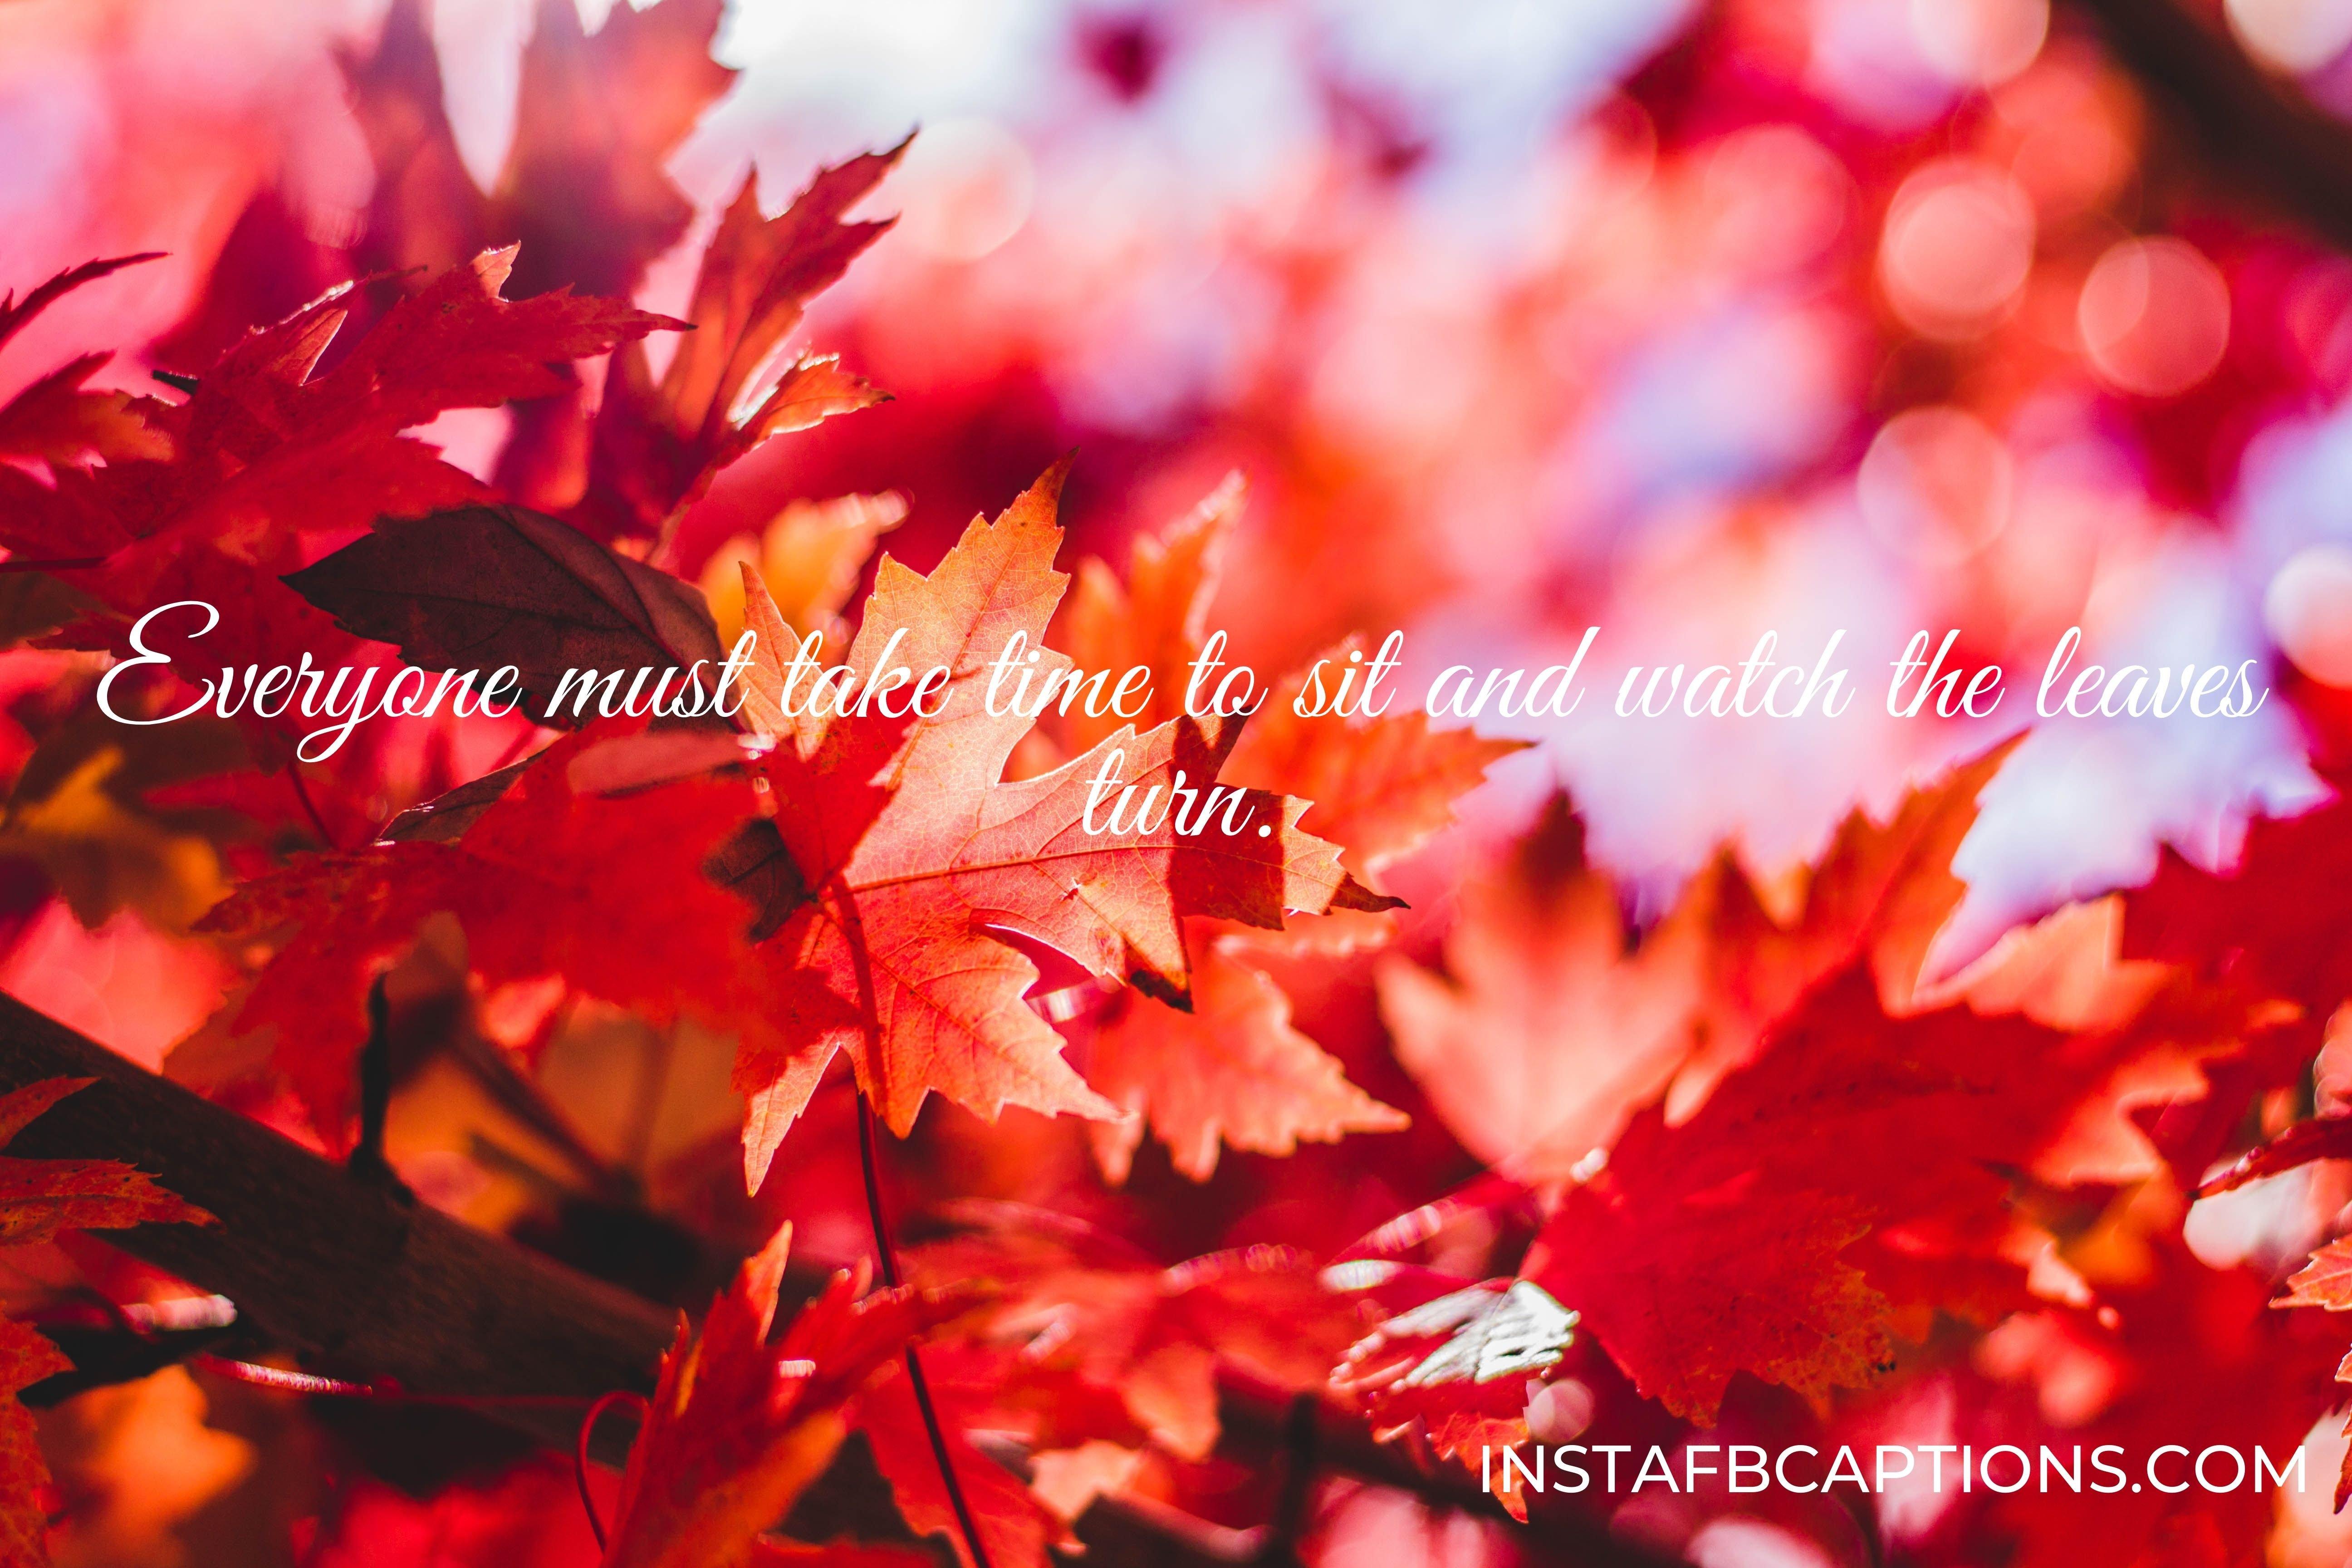 fall leaf captions  - INSTAFBCAPTIONS - Autumn Fall Season Captions || (Leaf Pumpkin Selfie)